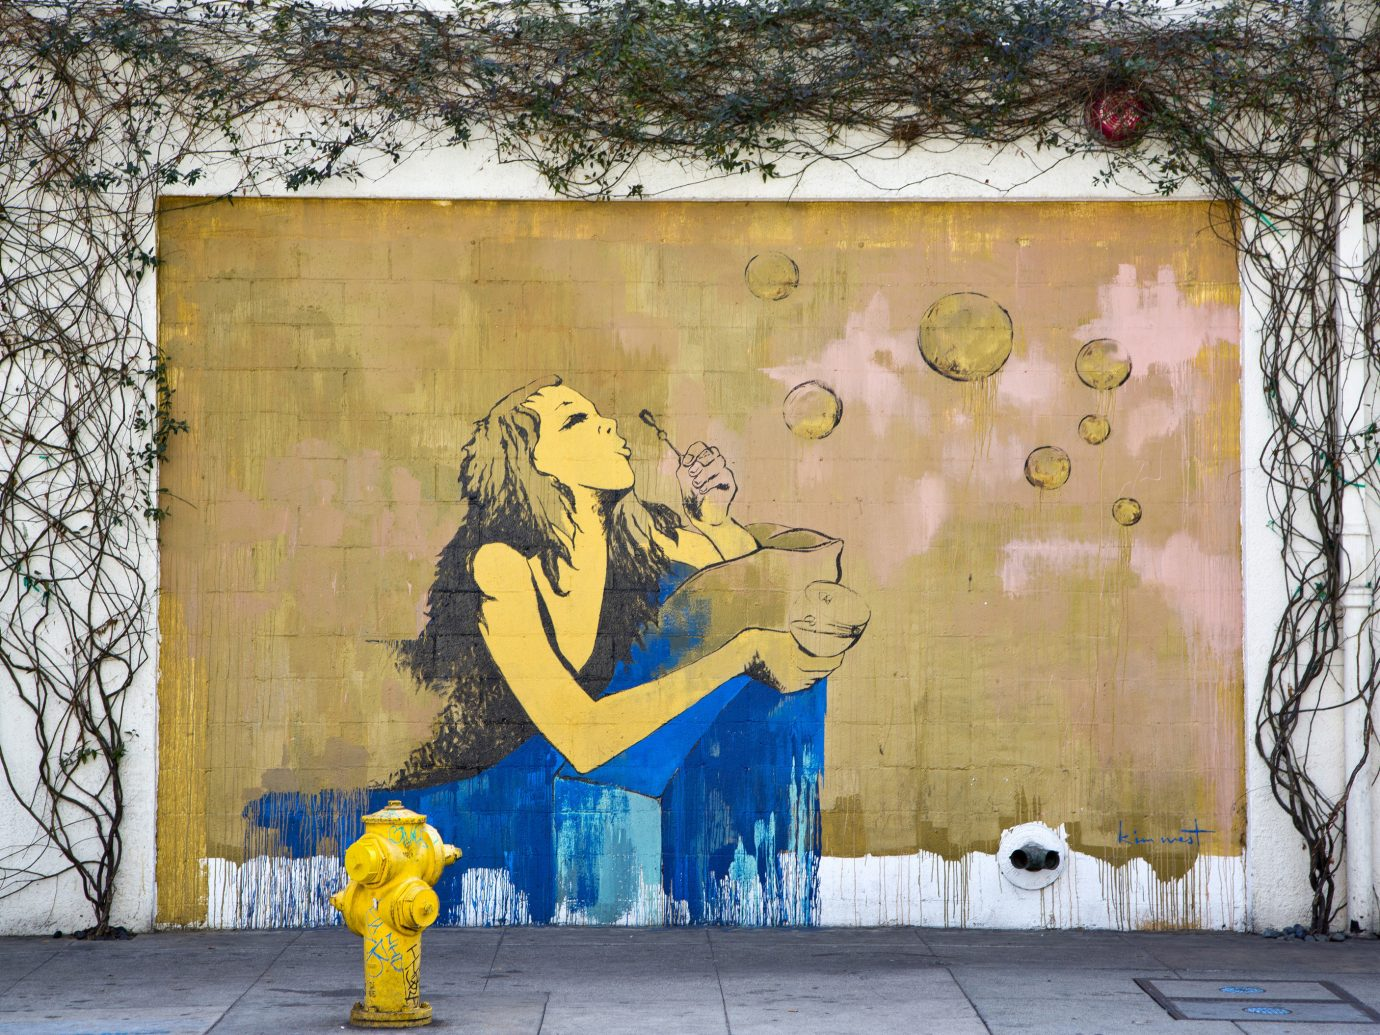 Trip Ideas tree outdoor color yellow hydrant mural wall urban area art graffiti street art road street painting painted